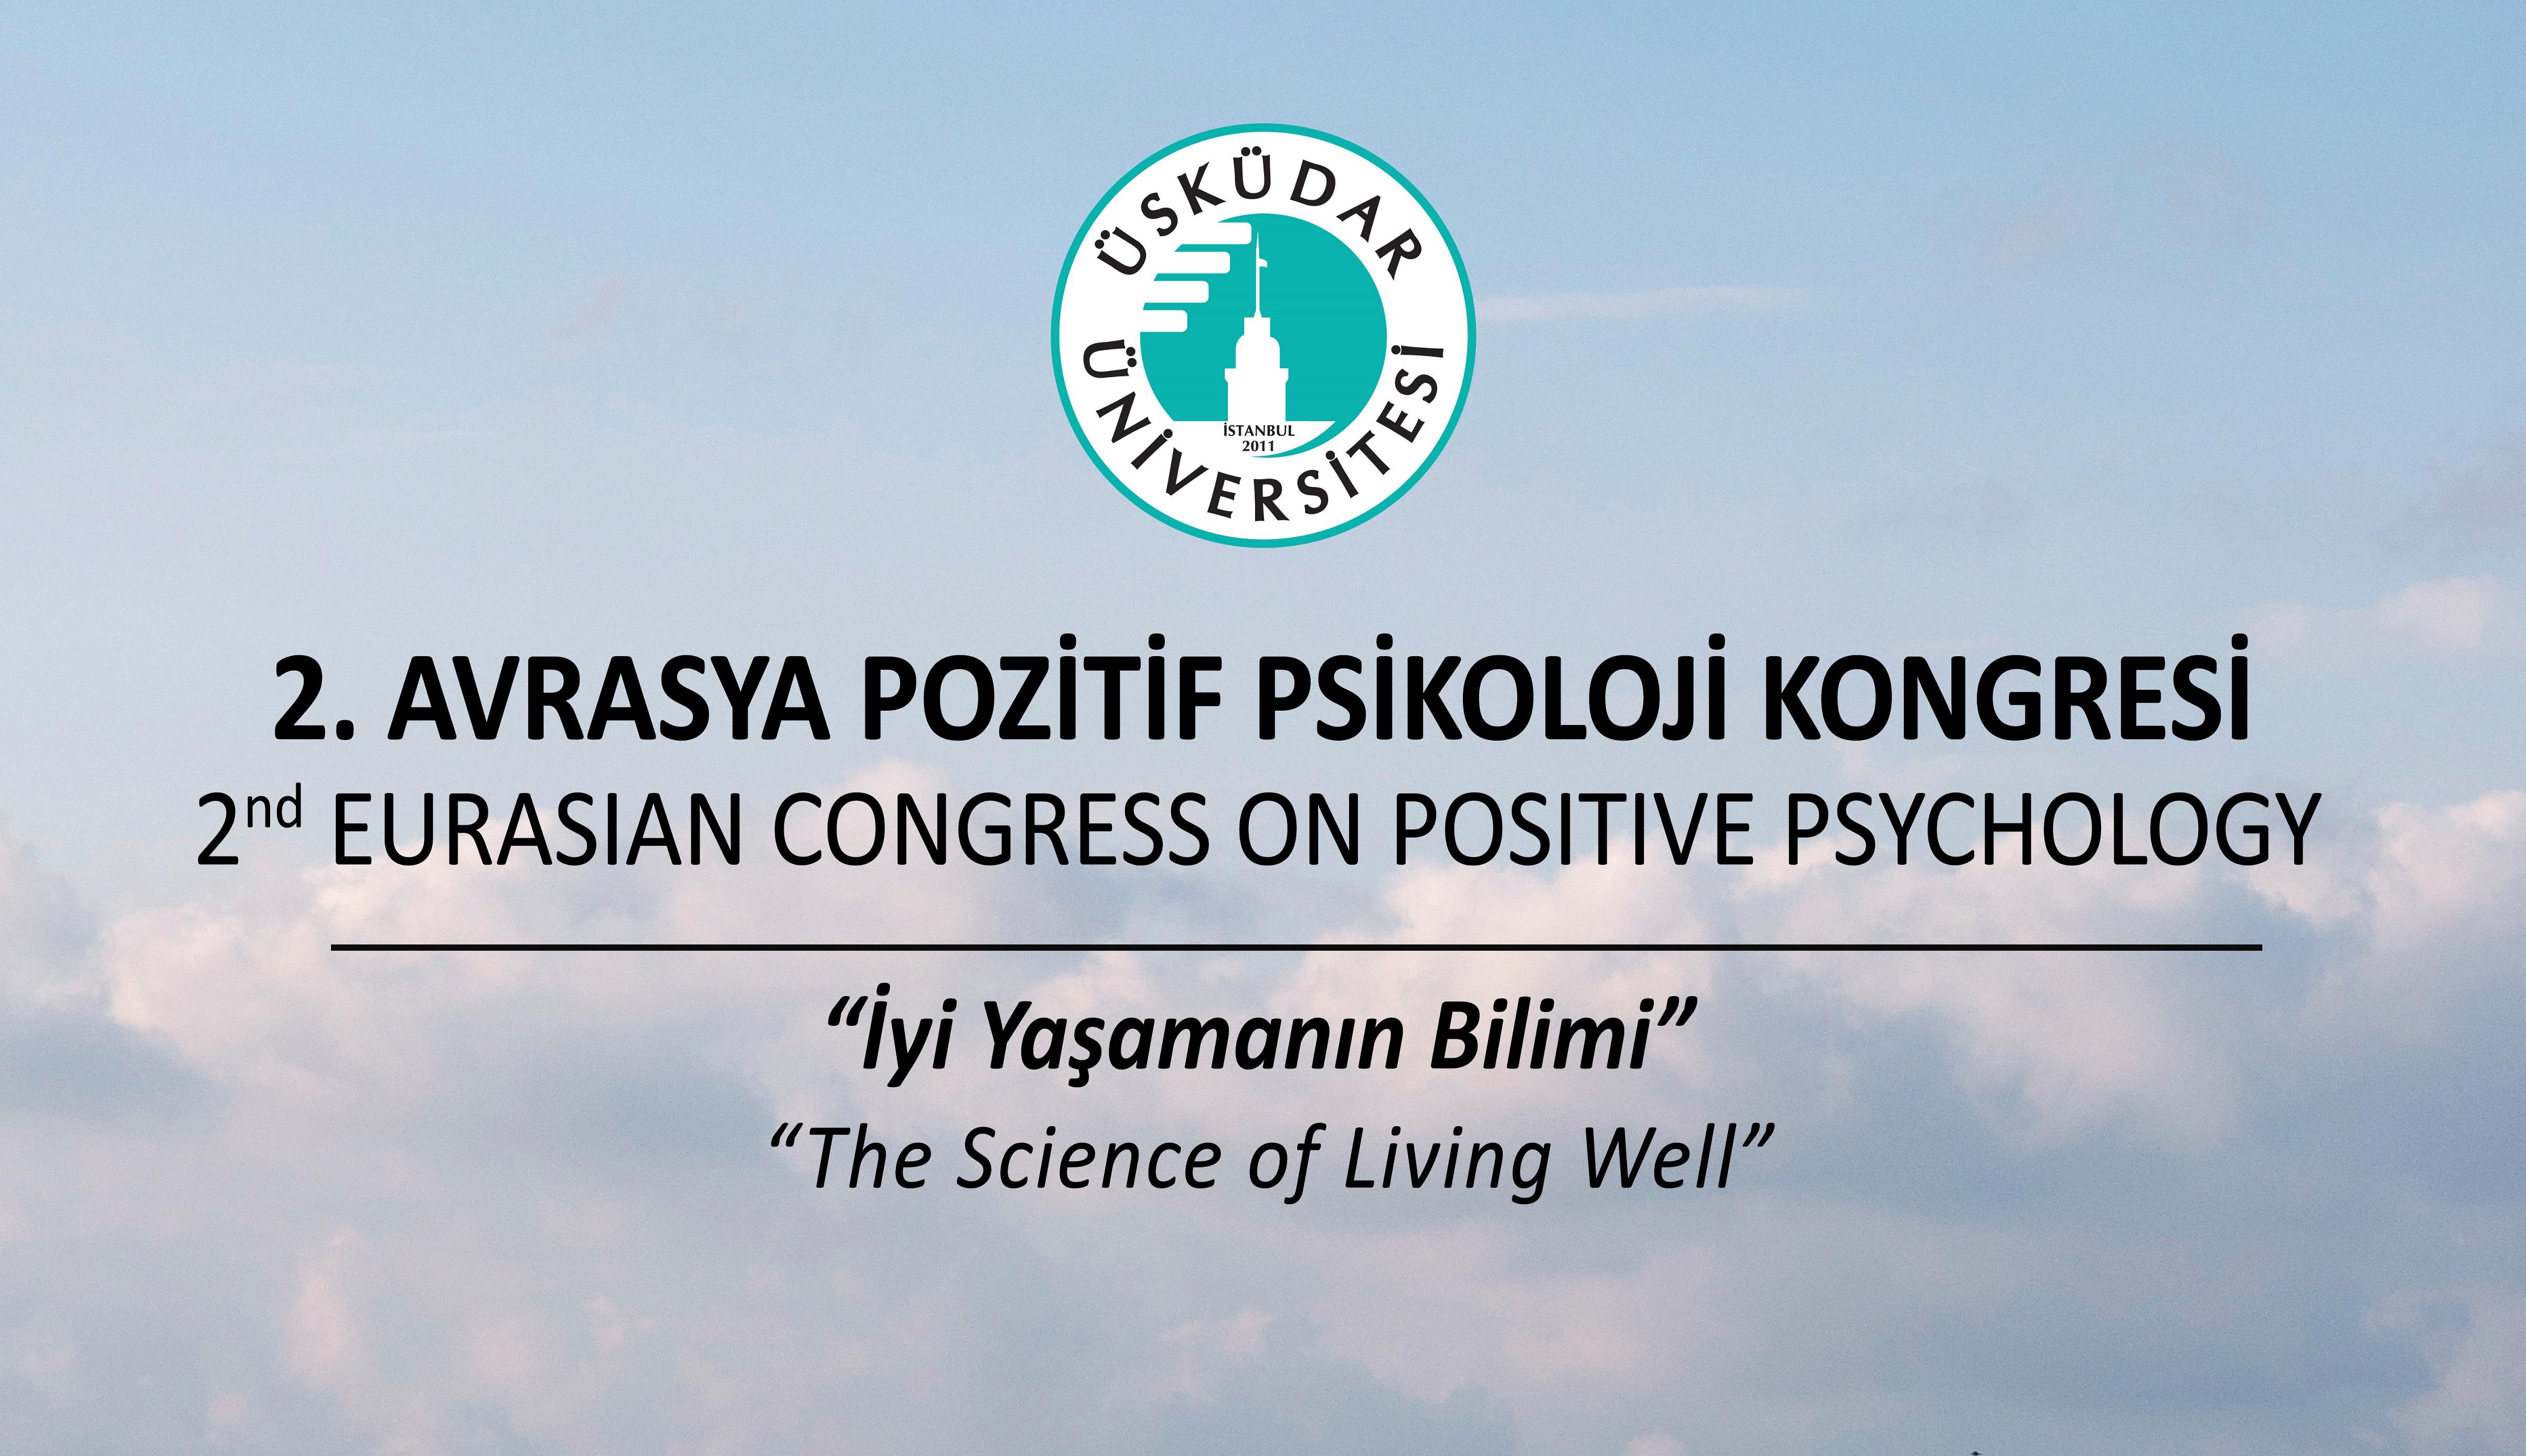 Pozitif Psikoloji Nedir